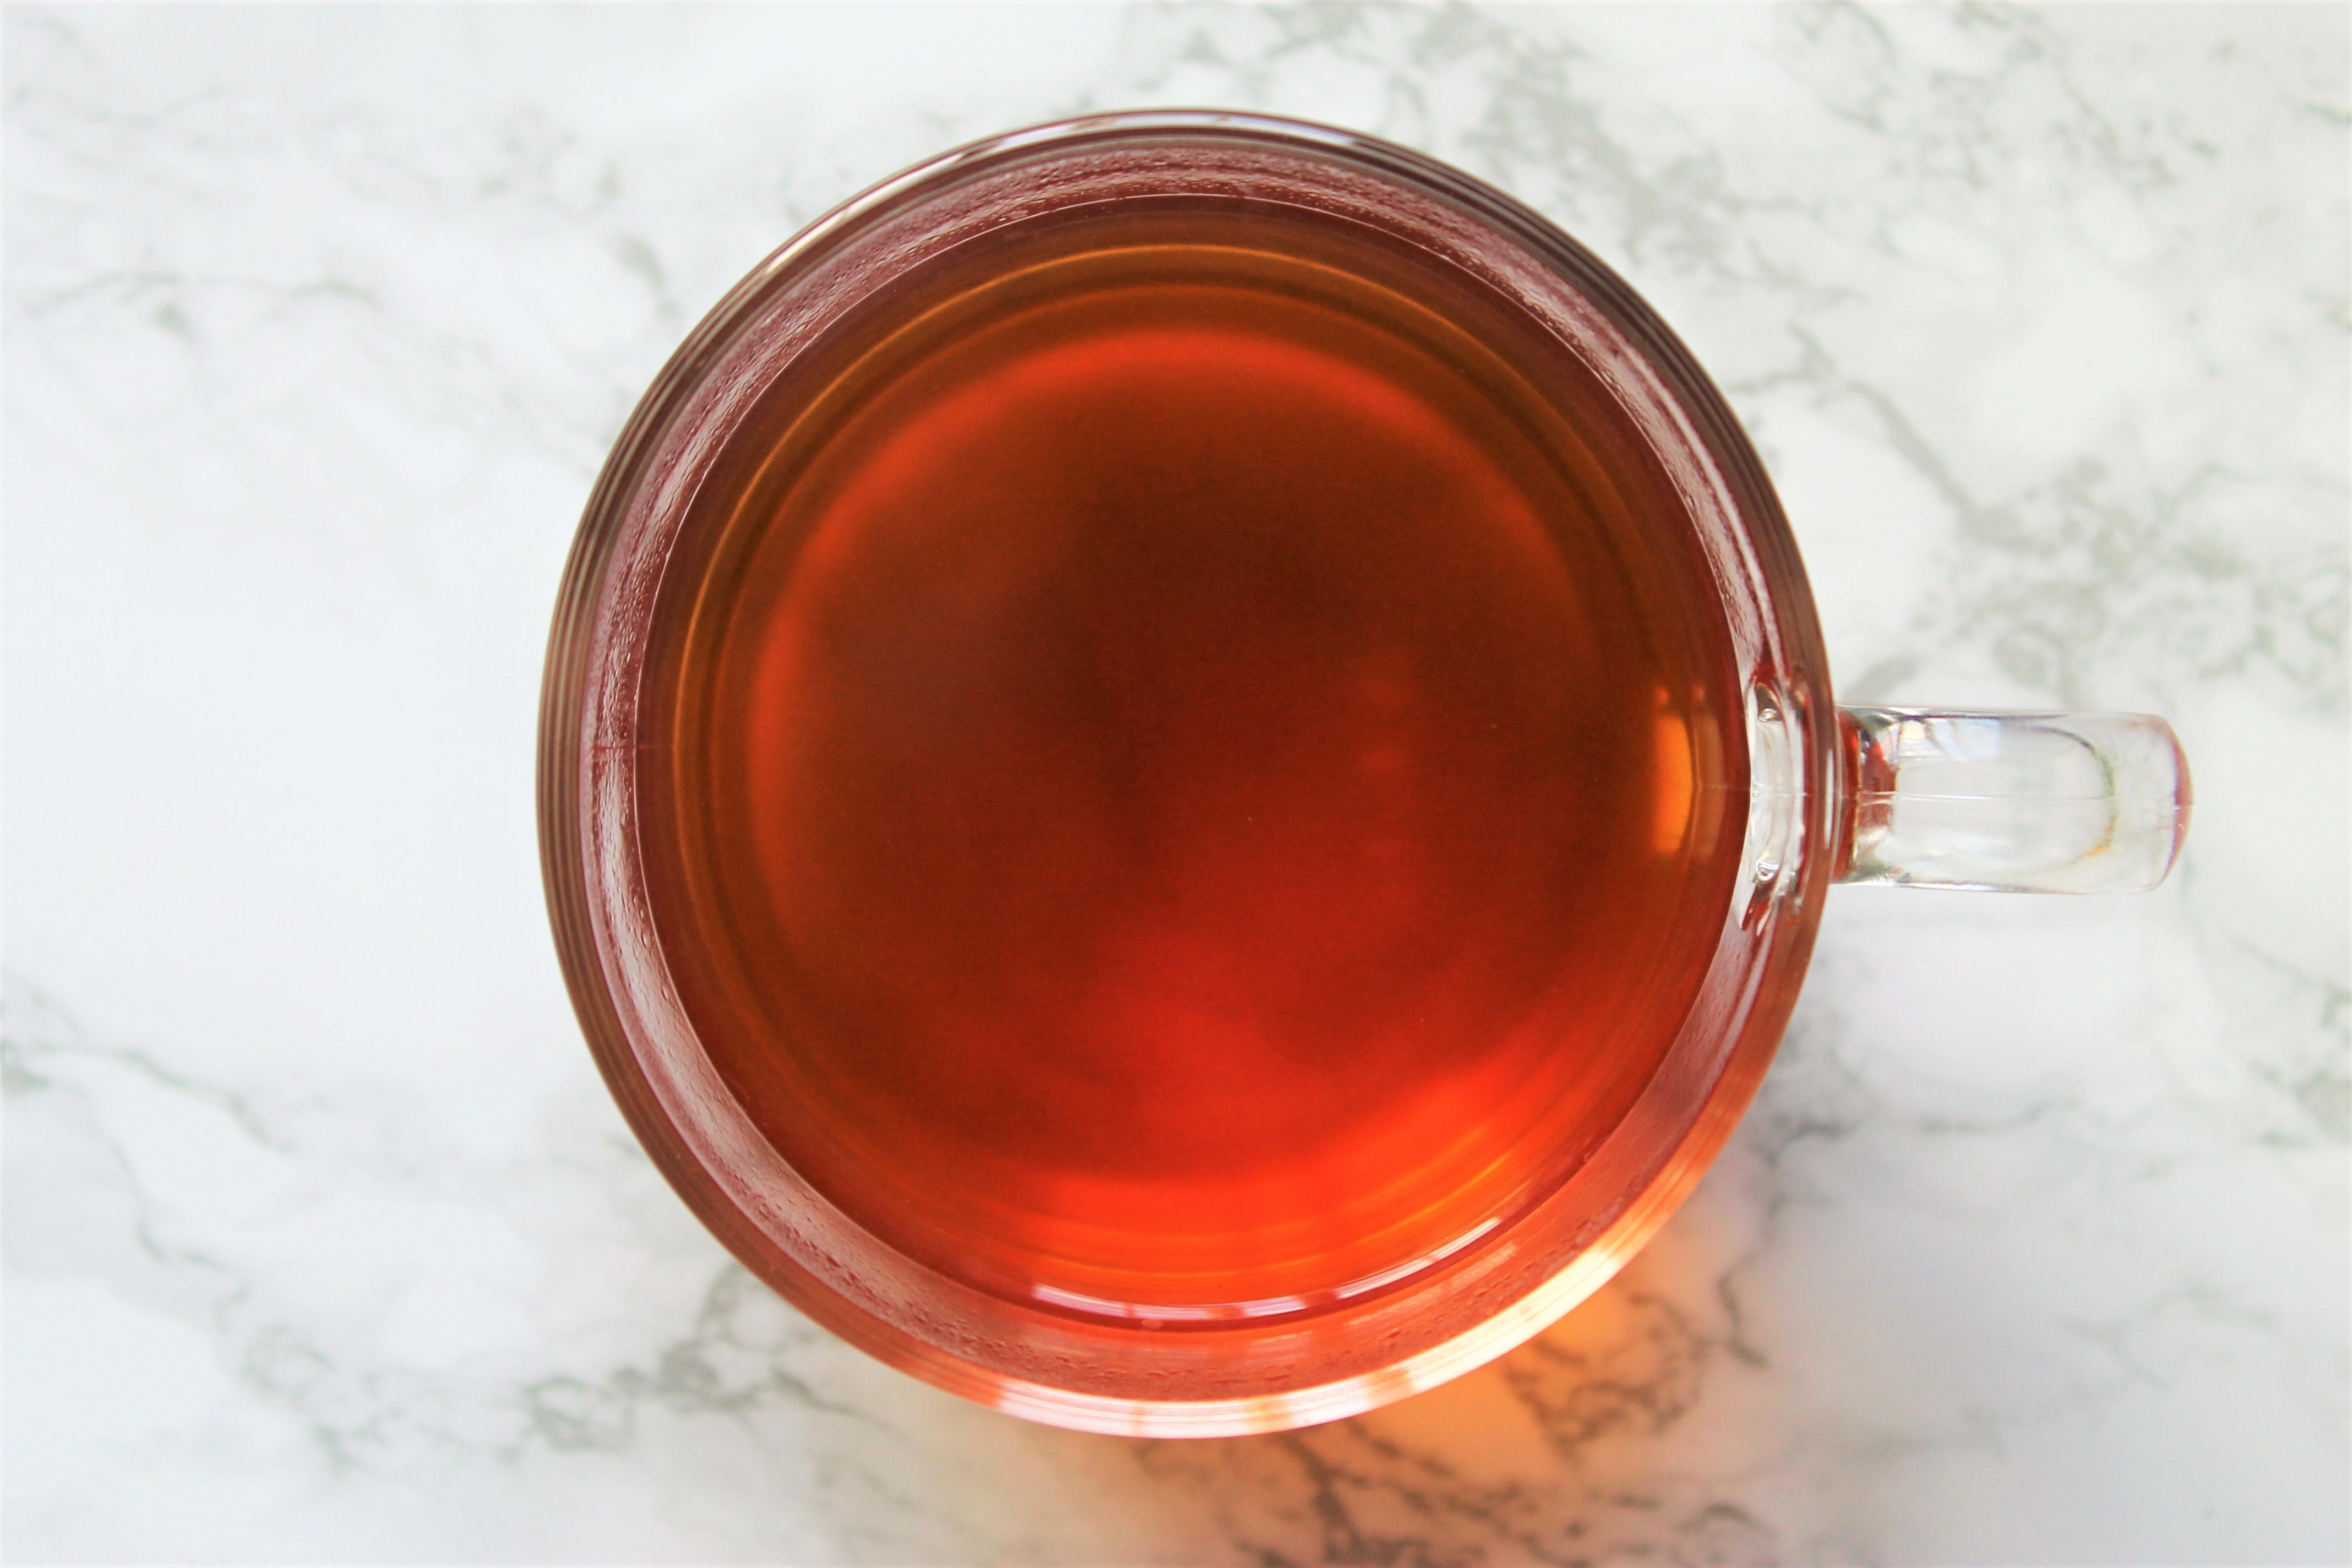 rooibos vanilla tea in glass teacup